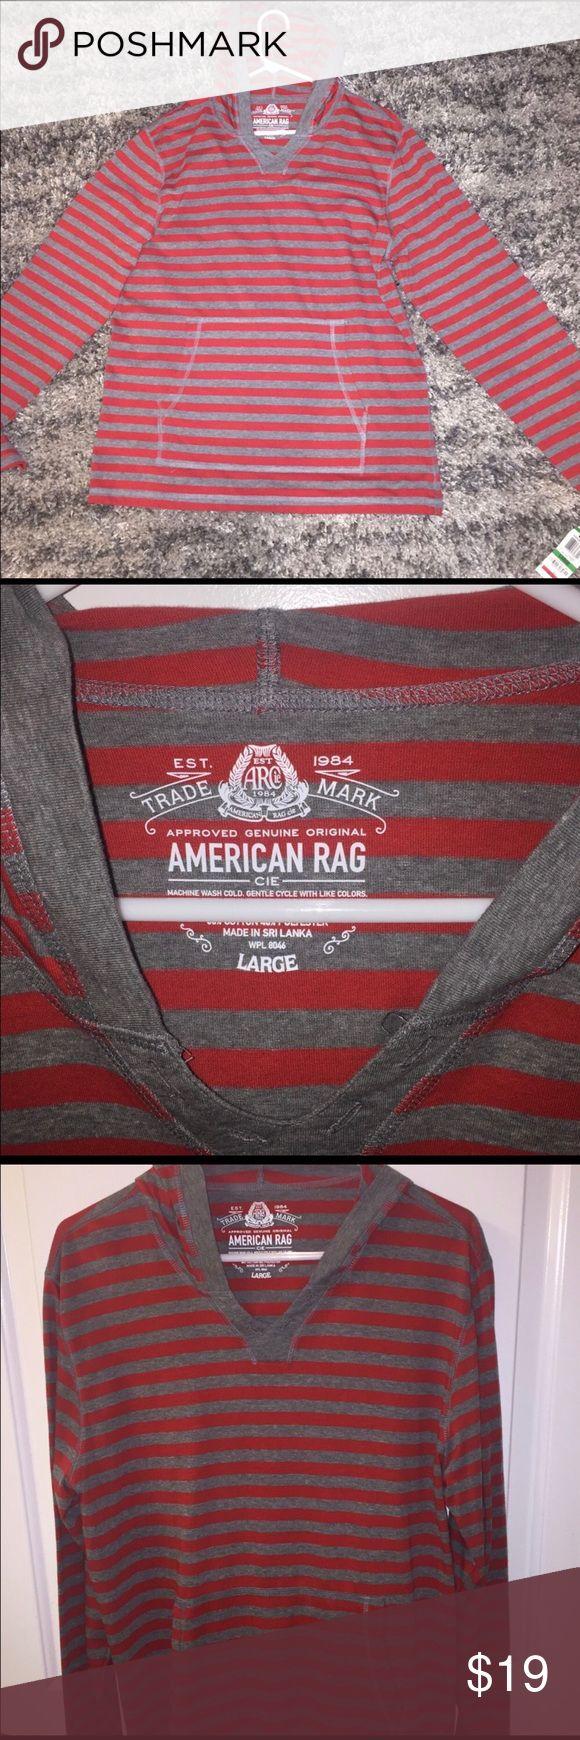 American Rag Men's Hoodie Shirt - L New w/ tags; awesome looking Hooded LS Shirt by American Rag.  Red & gray stripes. American Rag Shirts Sweatshirts & Hoodies